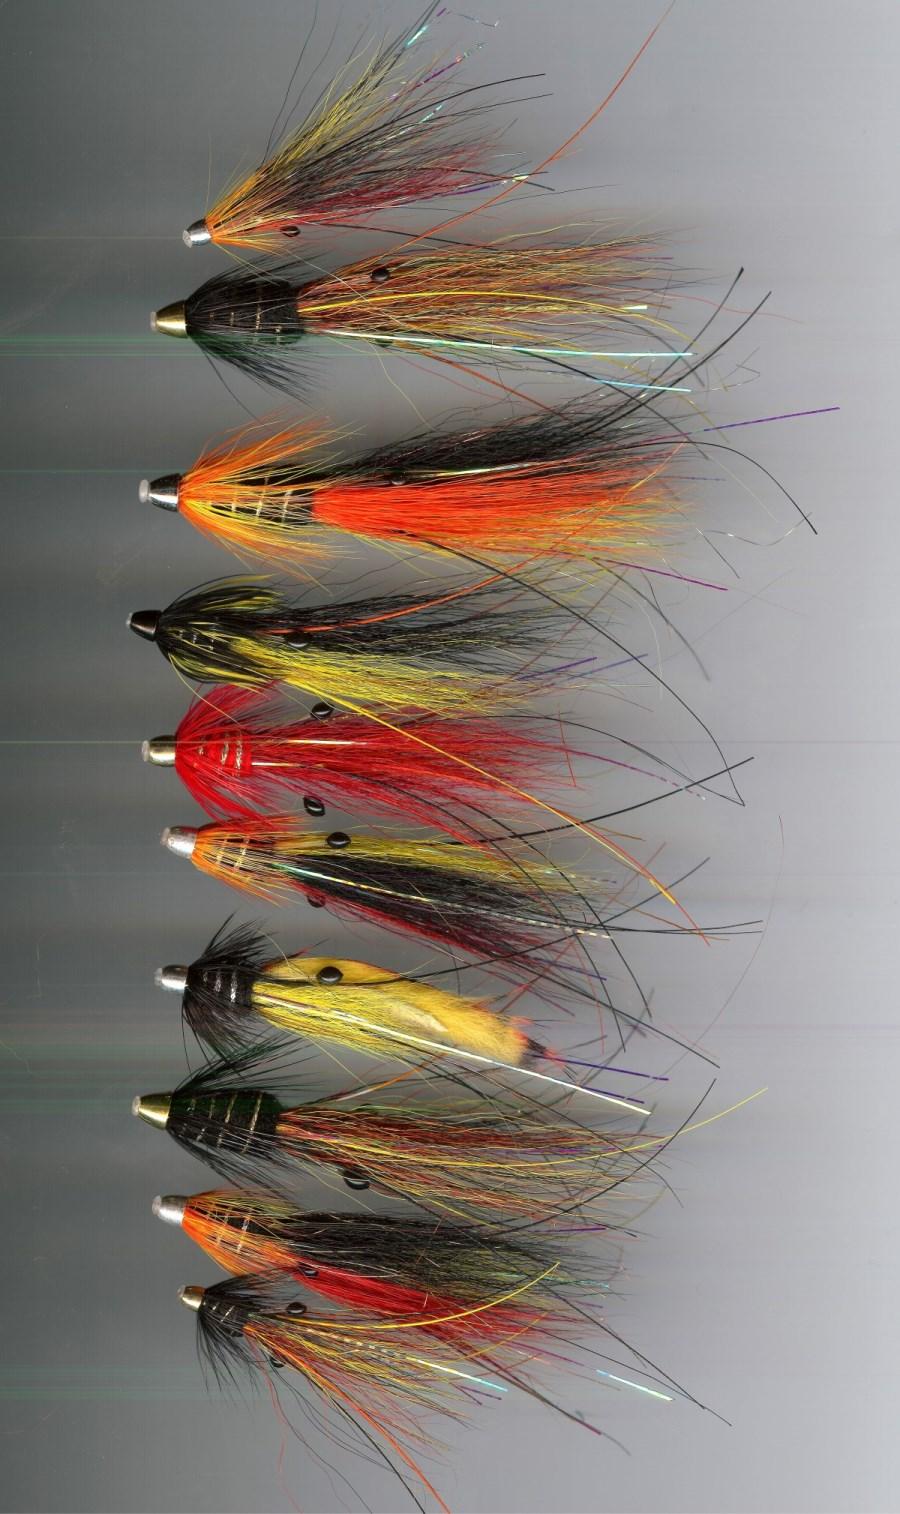 Cascade x 3 salmon flies Brass Conhead tubes